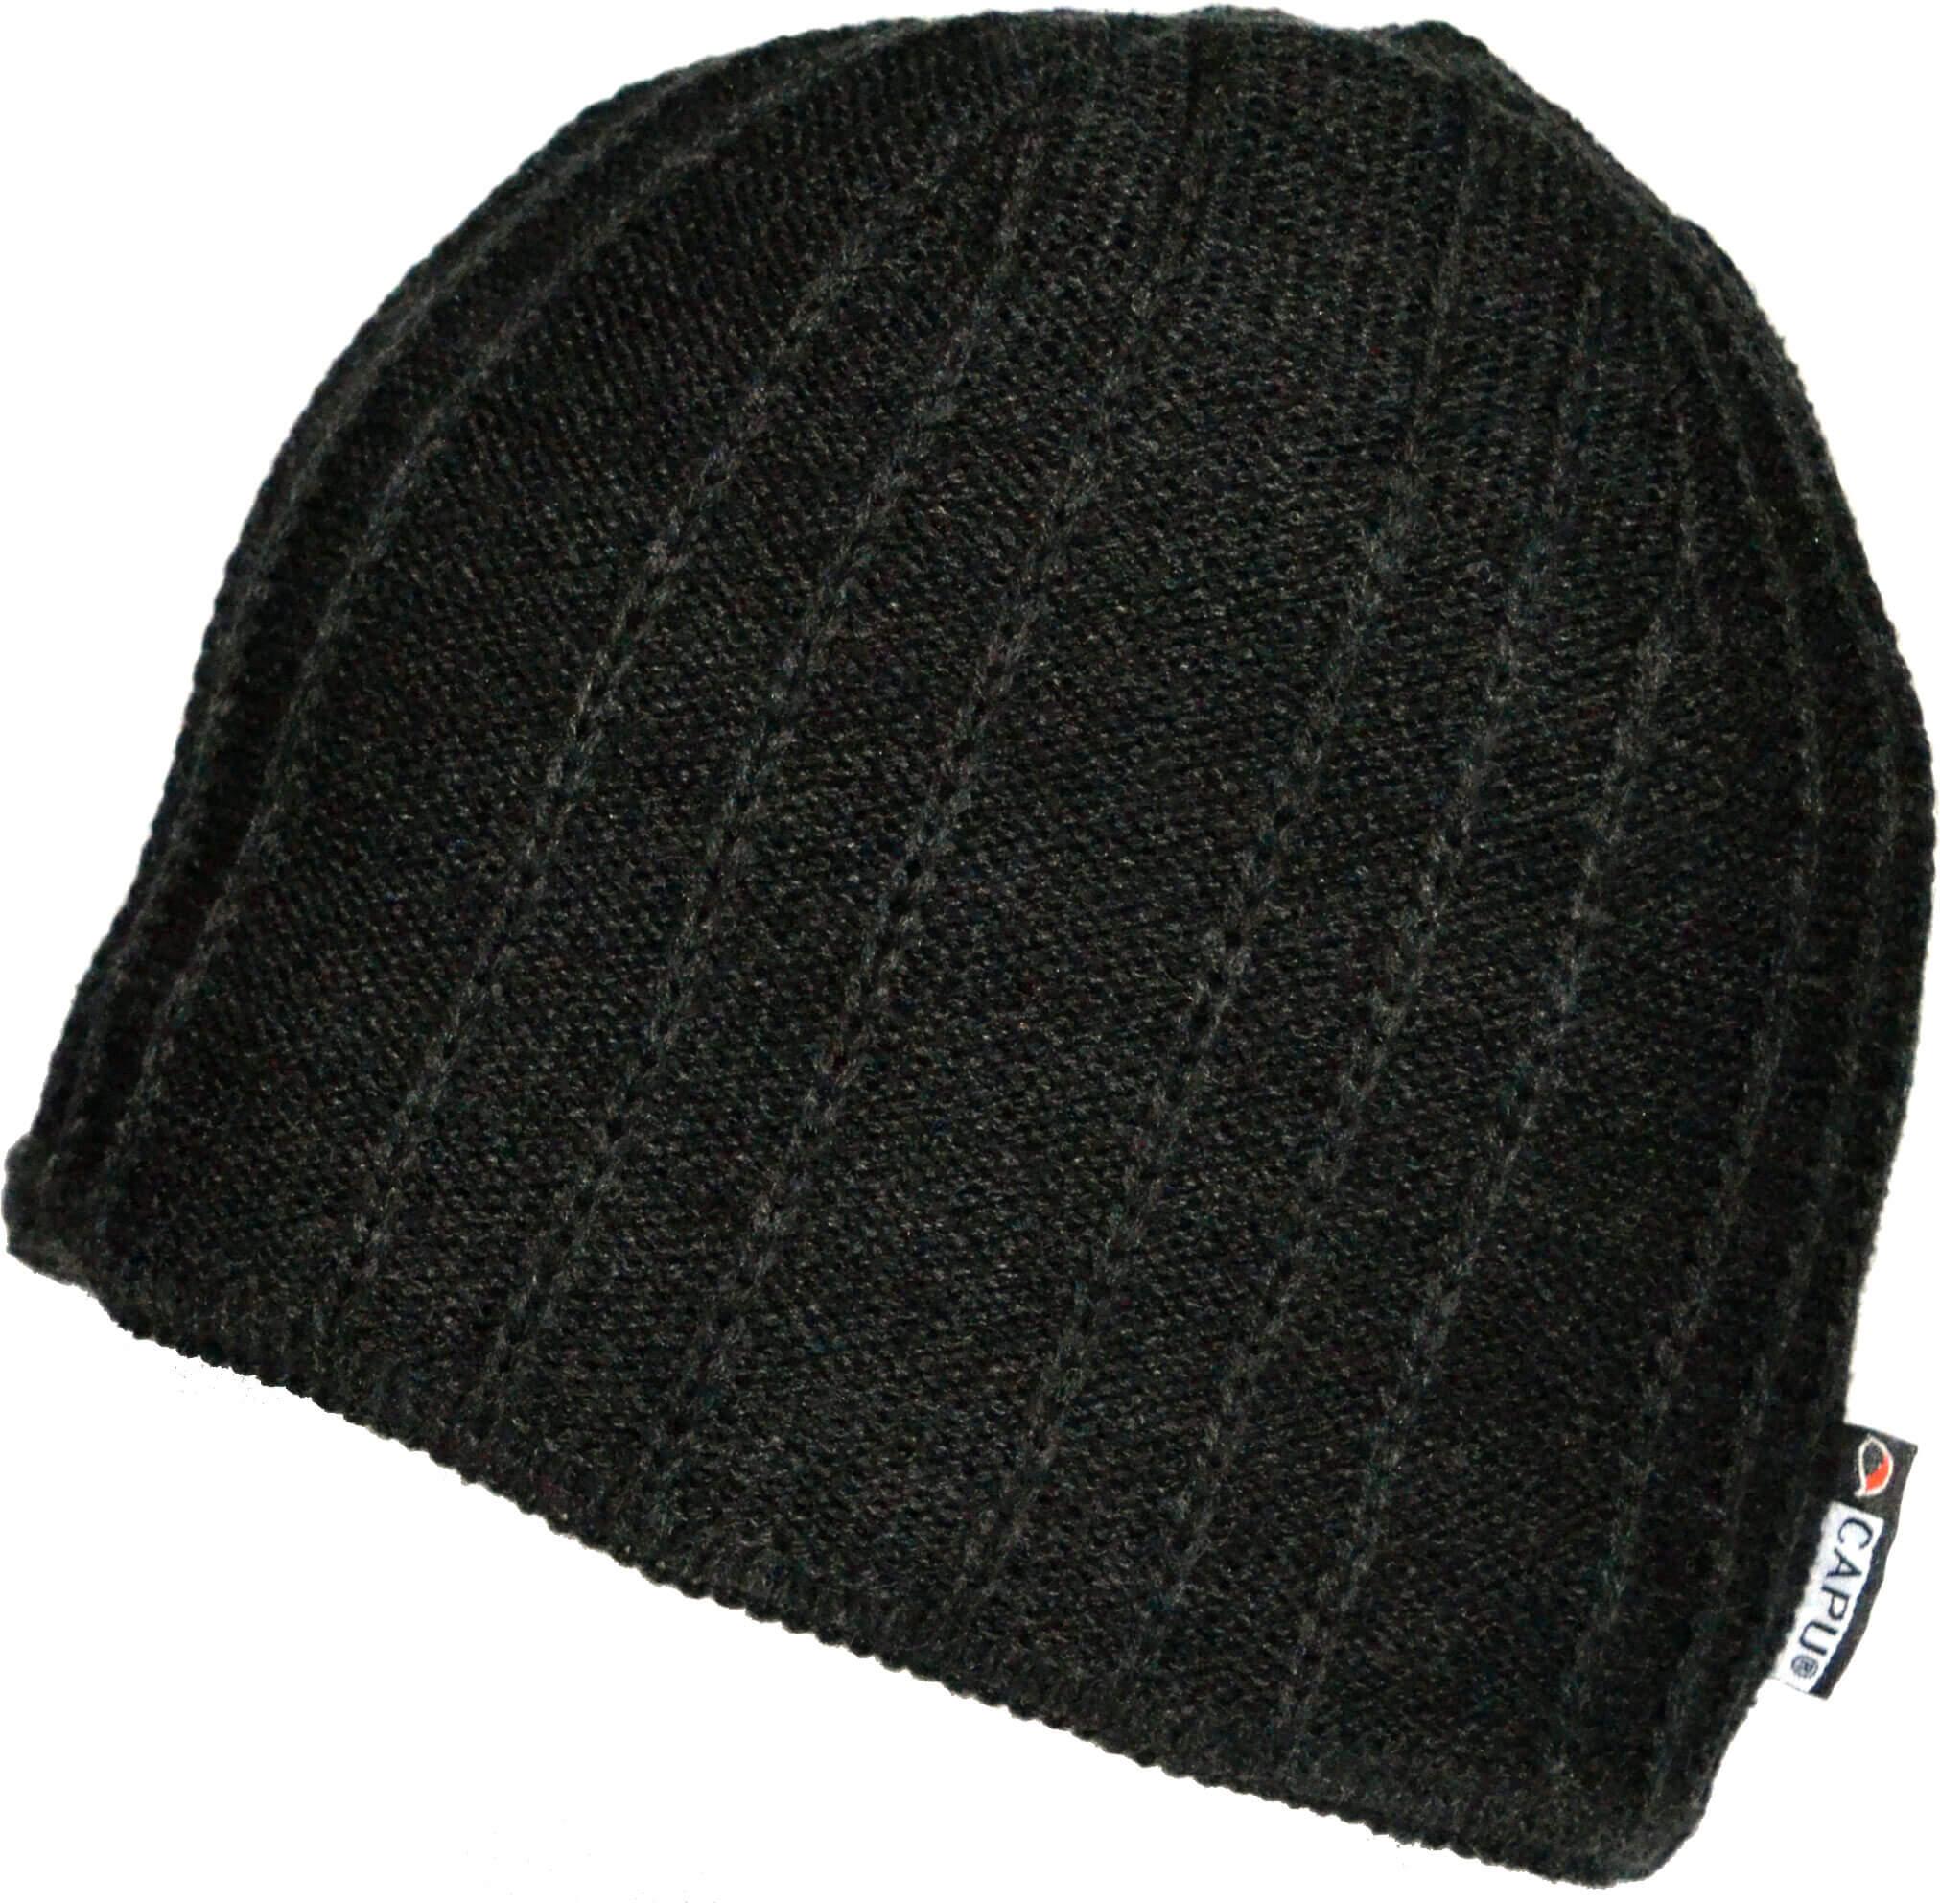 CAPU Téli kalap Black 4047-A  20f7c123be